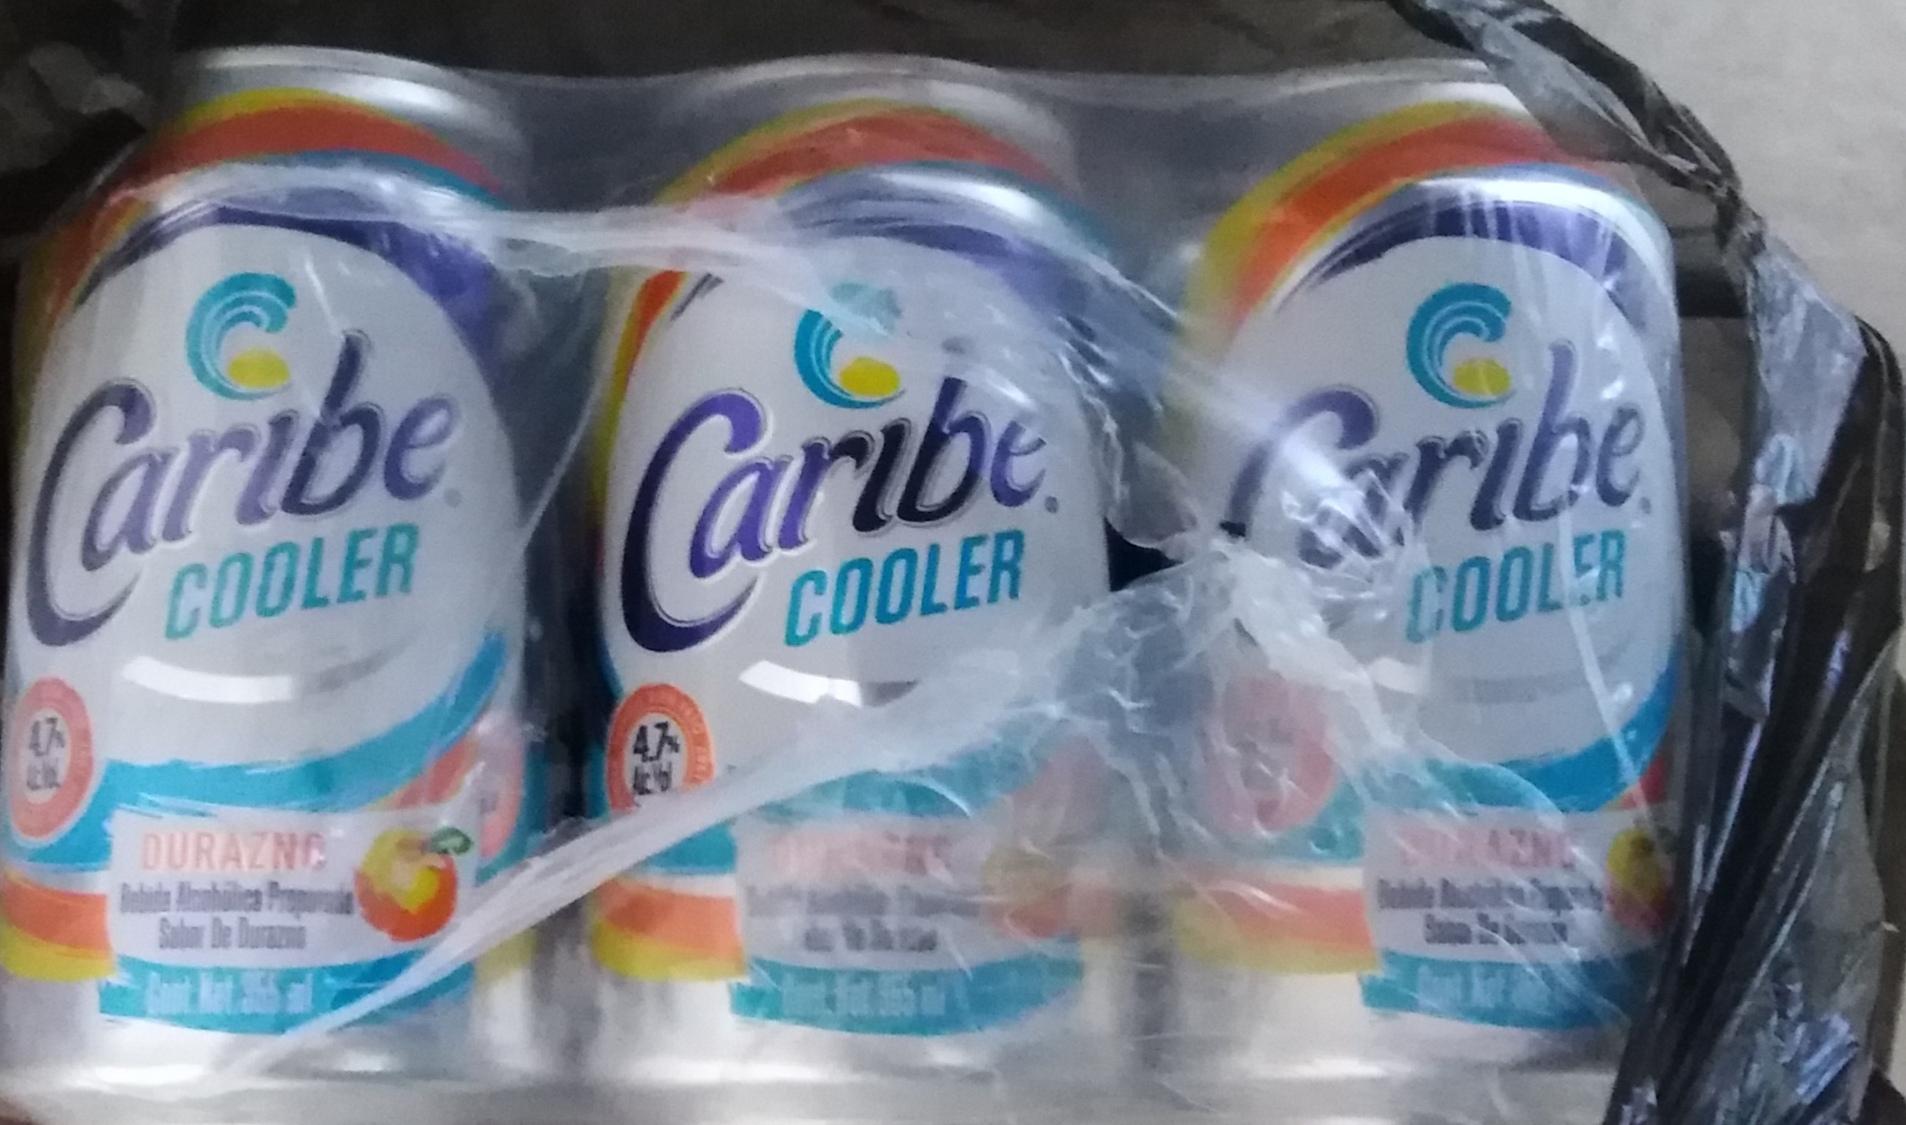 Bodega Aurrerá: Caribe cooler durazno 5 pesitos